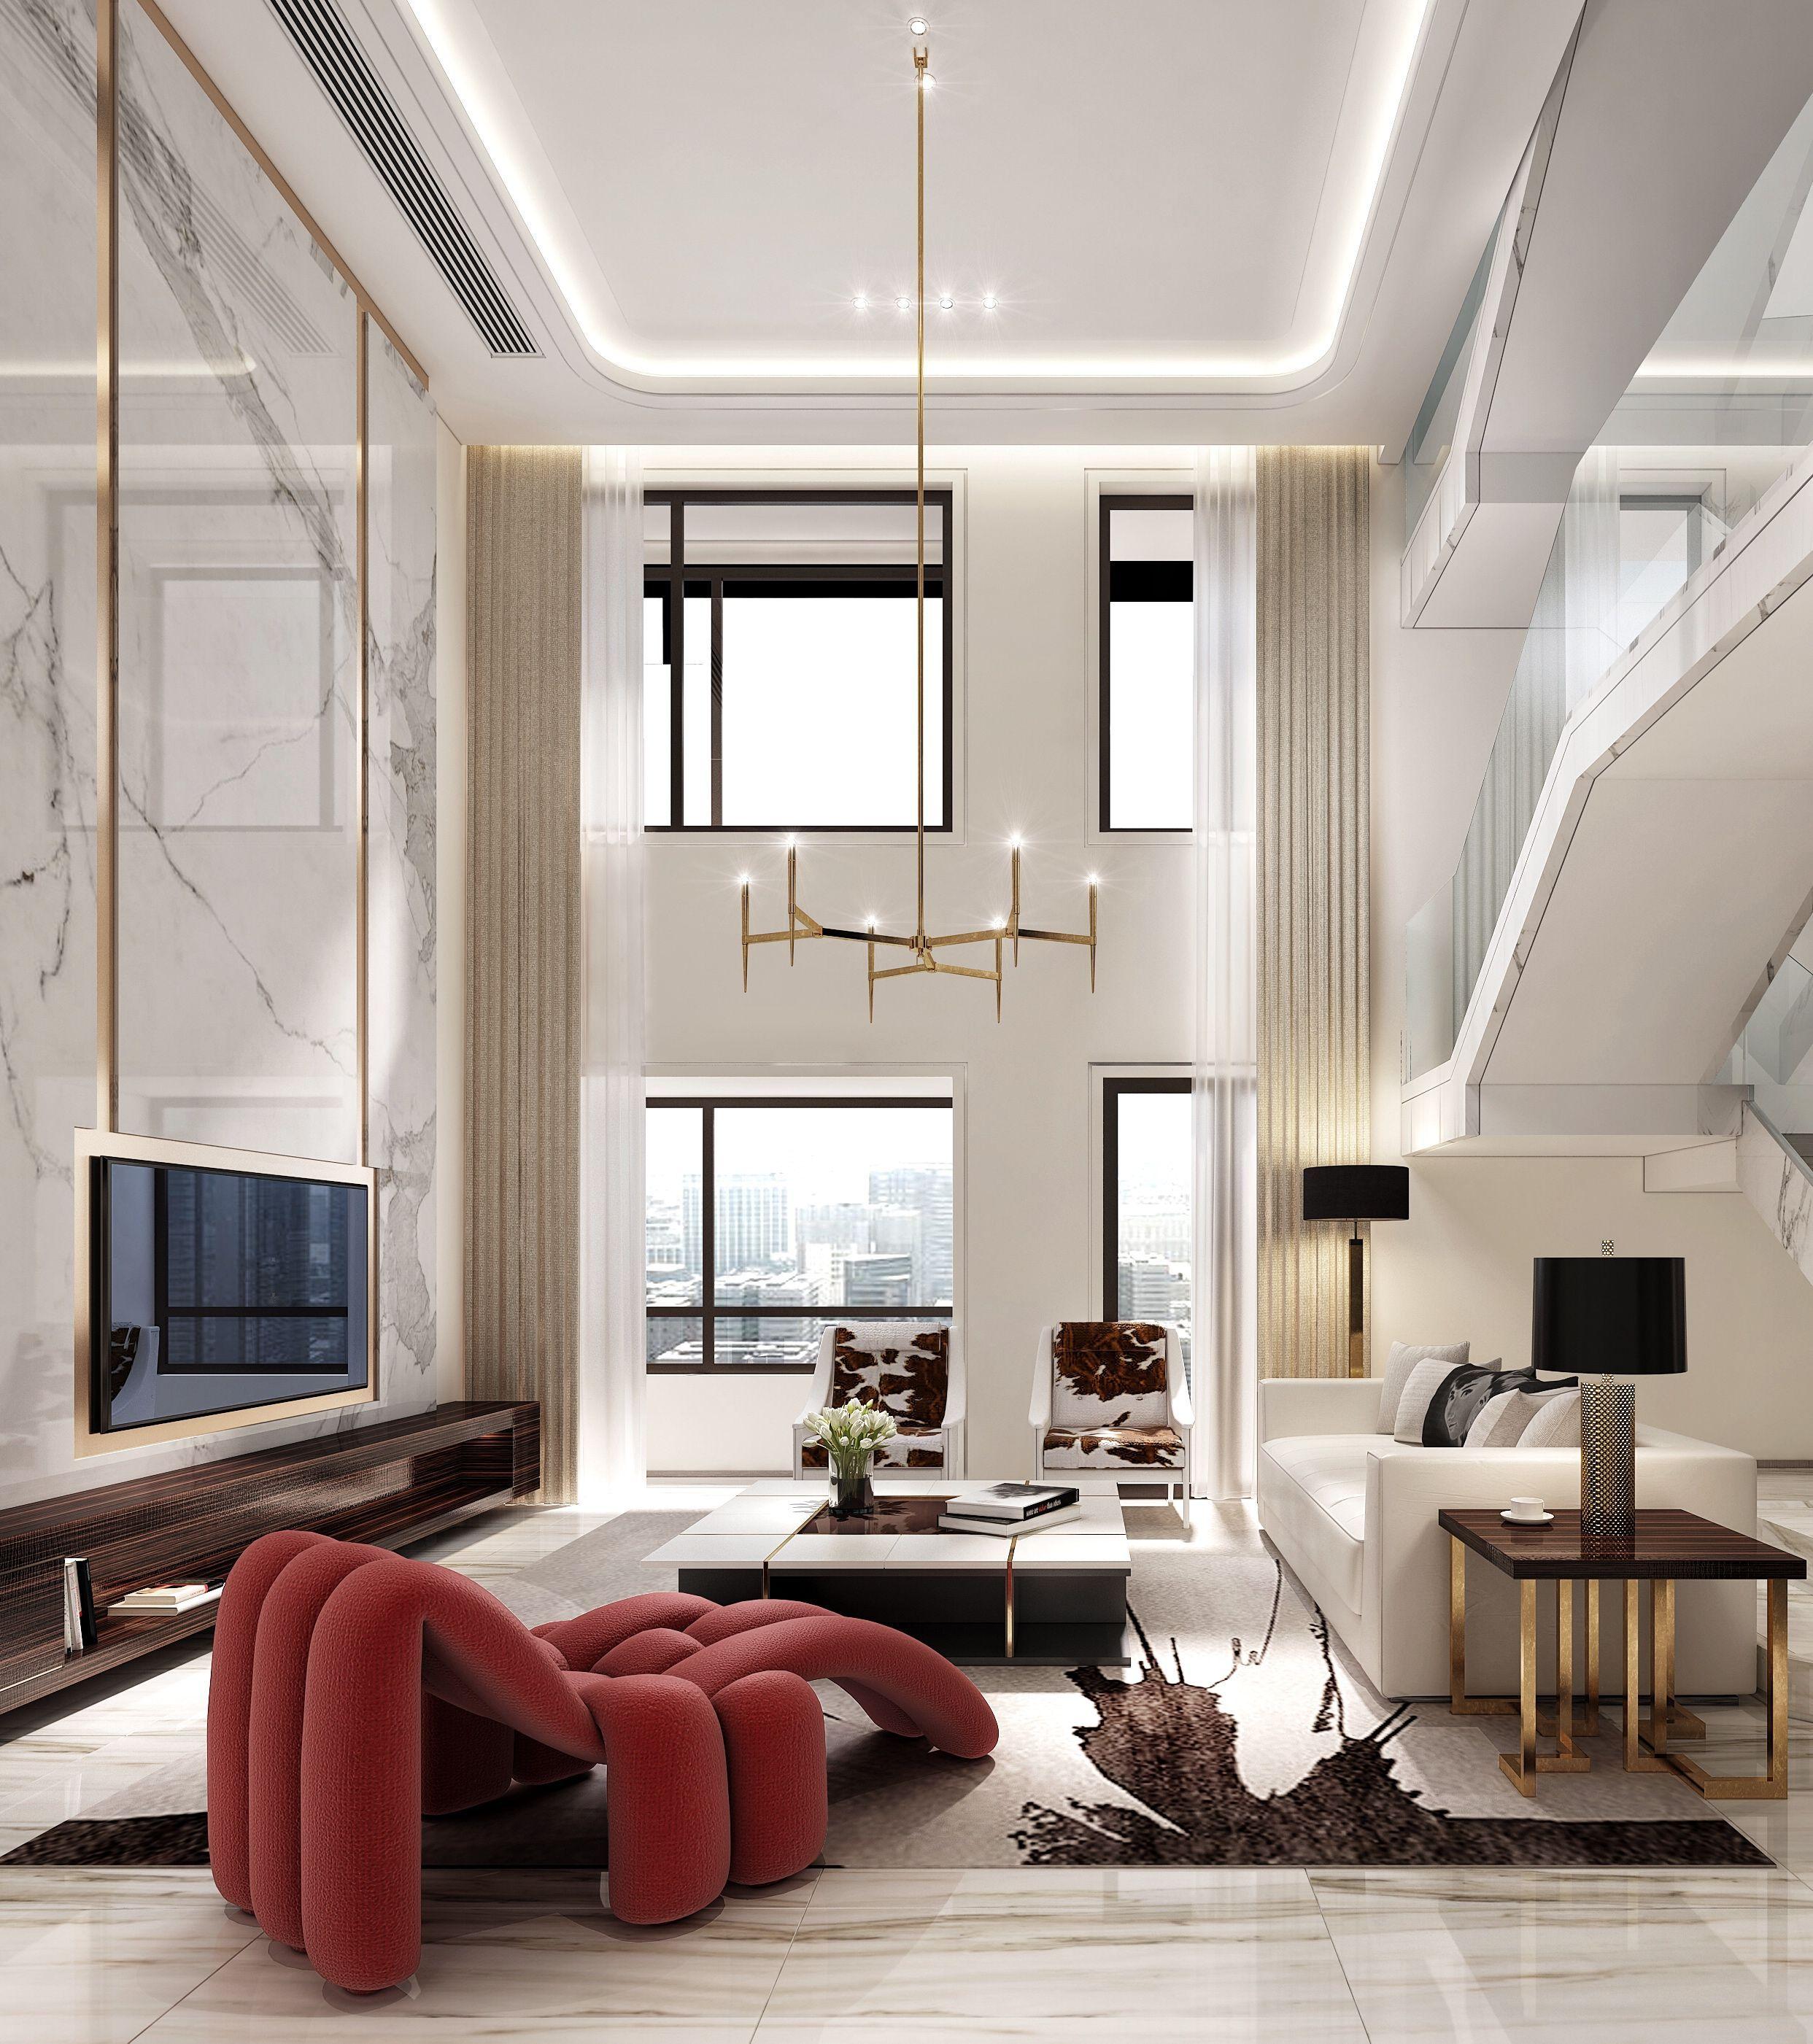 Living Room Decor Styles Luxury Interior Design Interior Design Living Room Luxury Interior